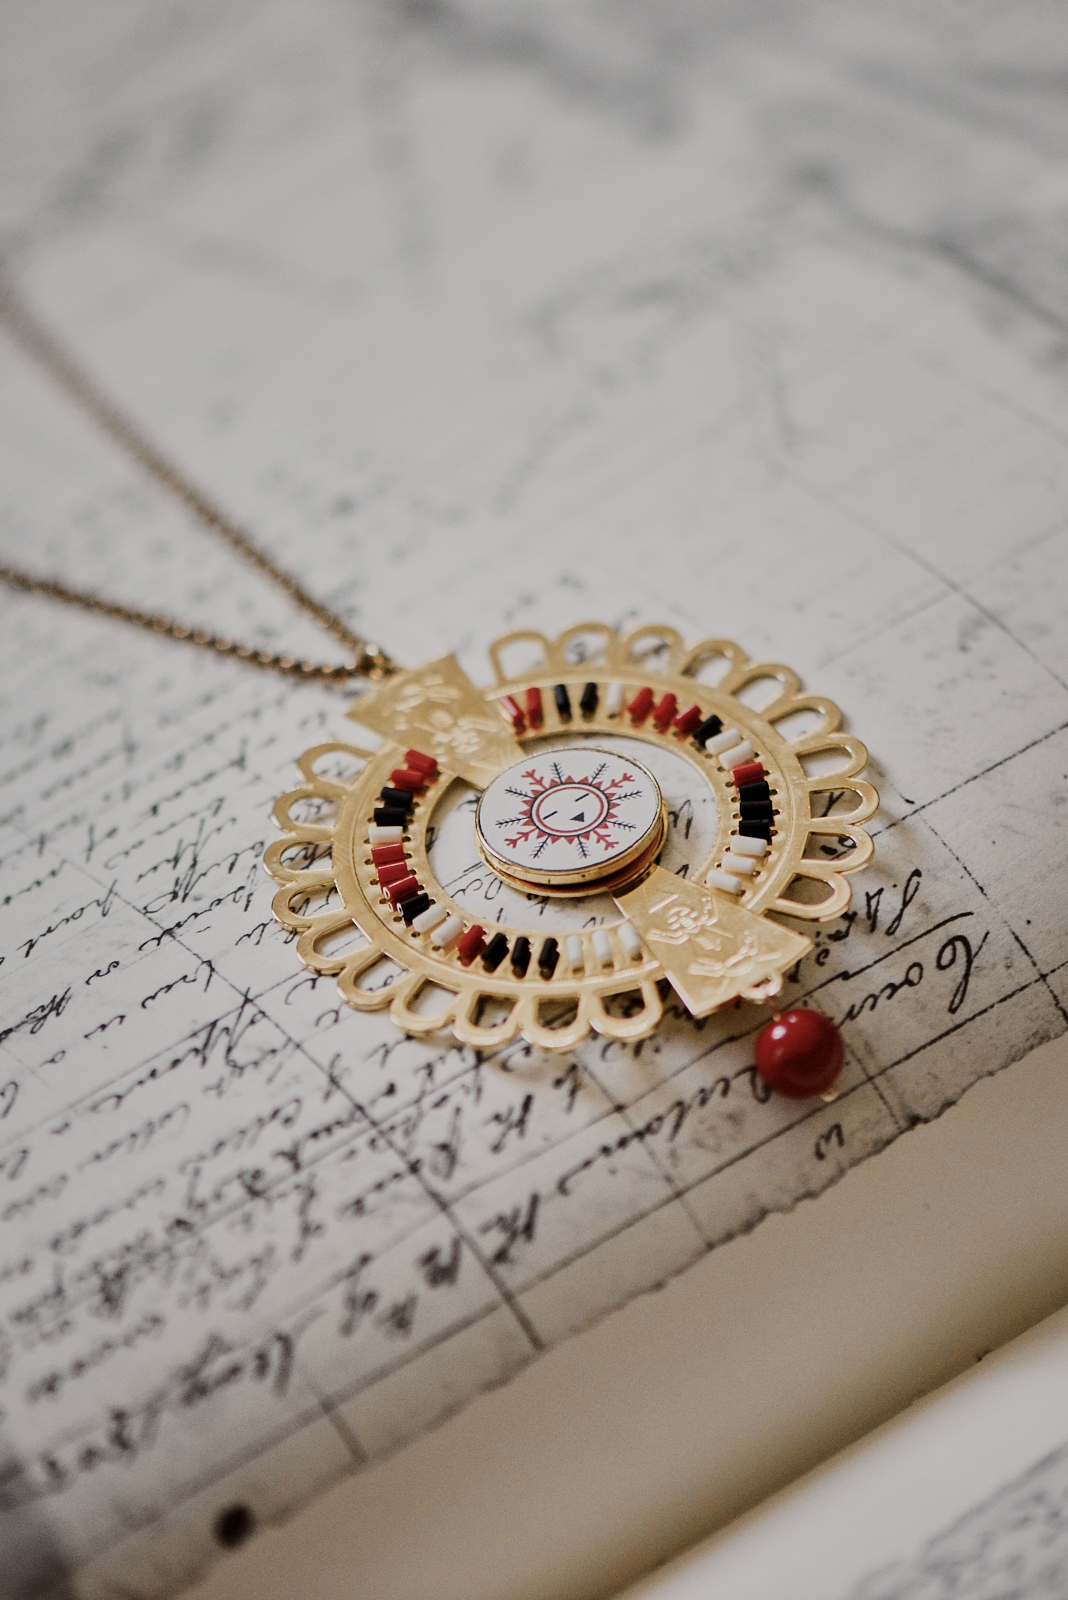 Pôle Bijou Galerie